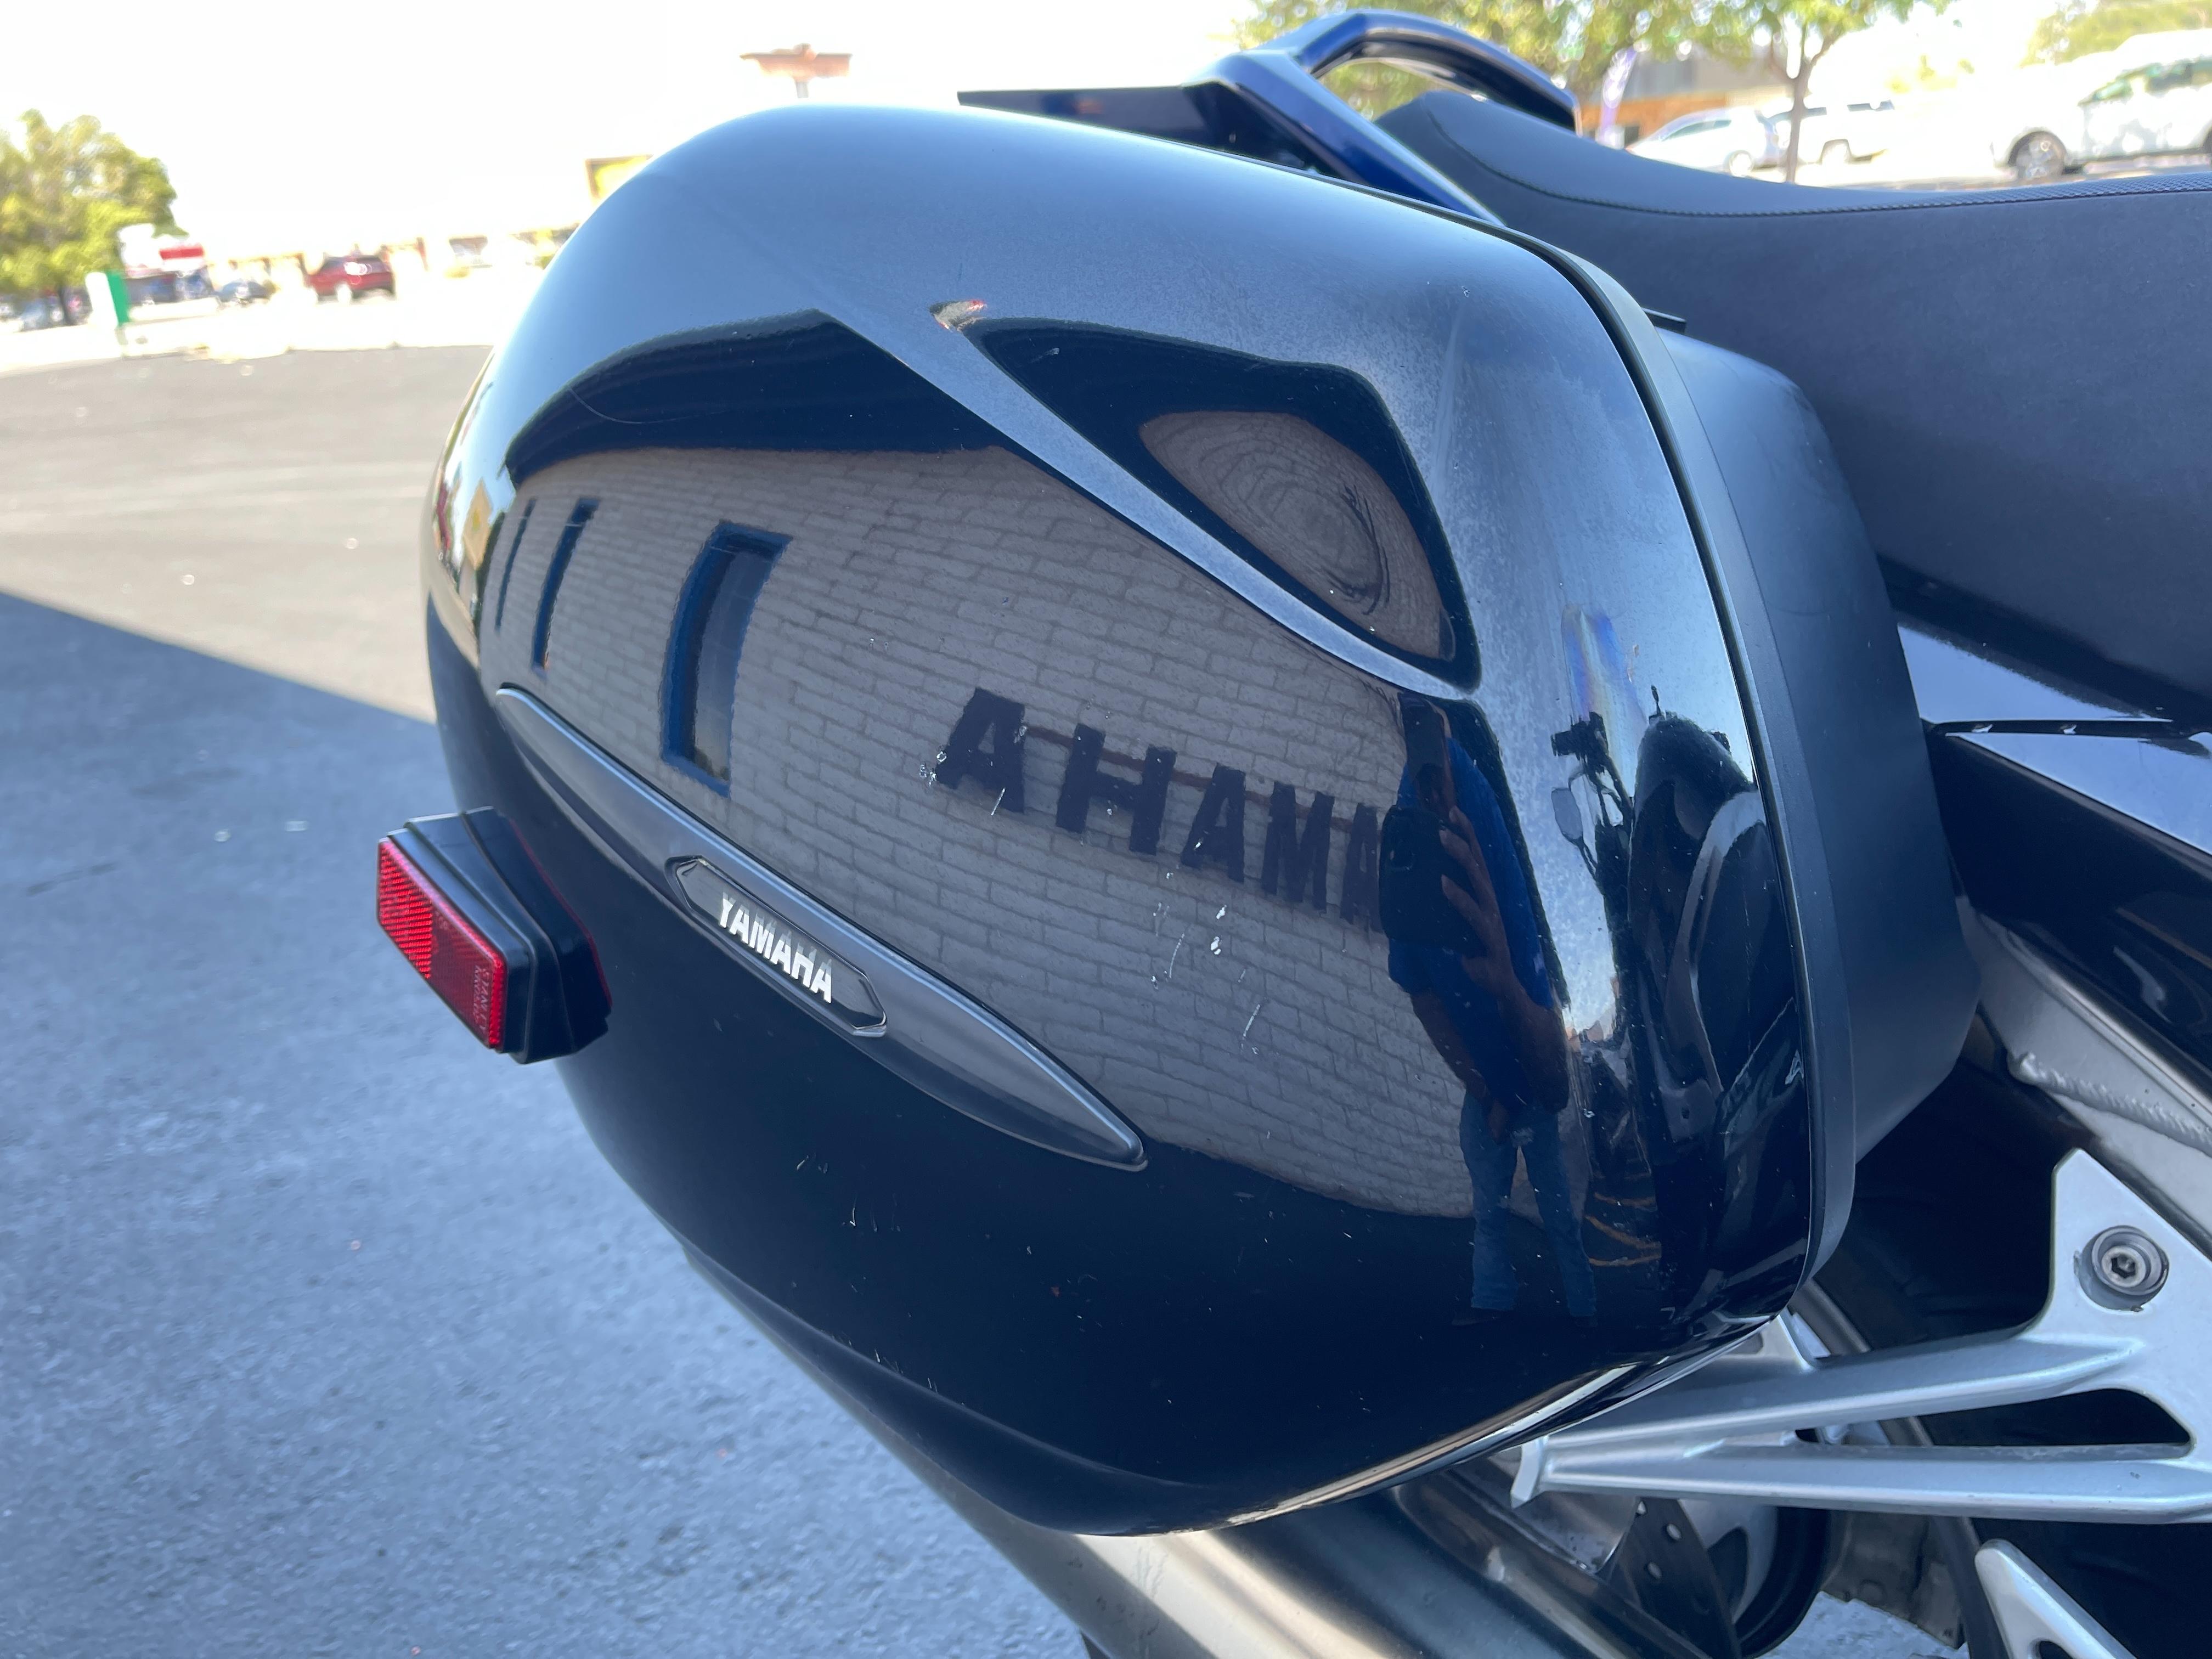 2008 Yamaha FJR 1300A at Bobby J's Yamaha, Albuquerque, NM 87110